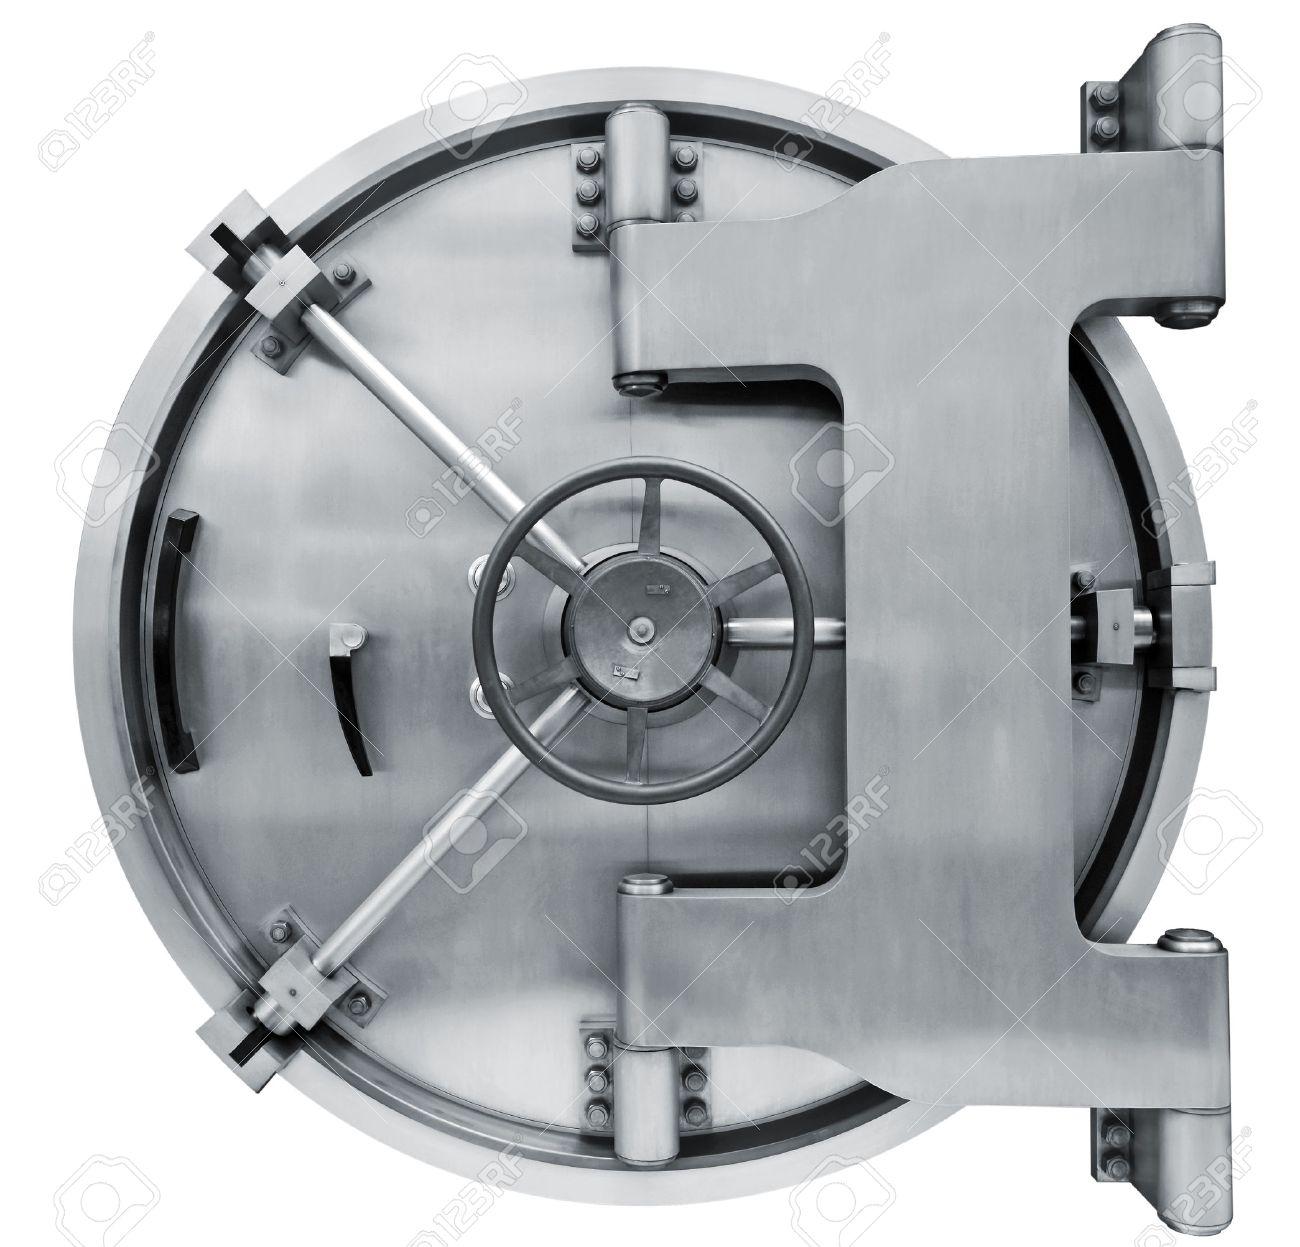 La Porte De La Chambre Forte De La Banque Métallique Sur Un Fond ...